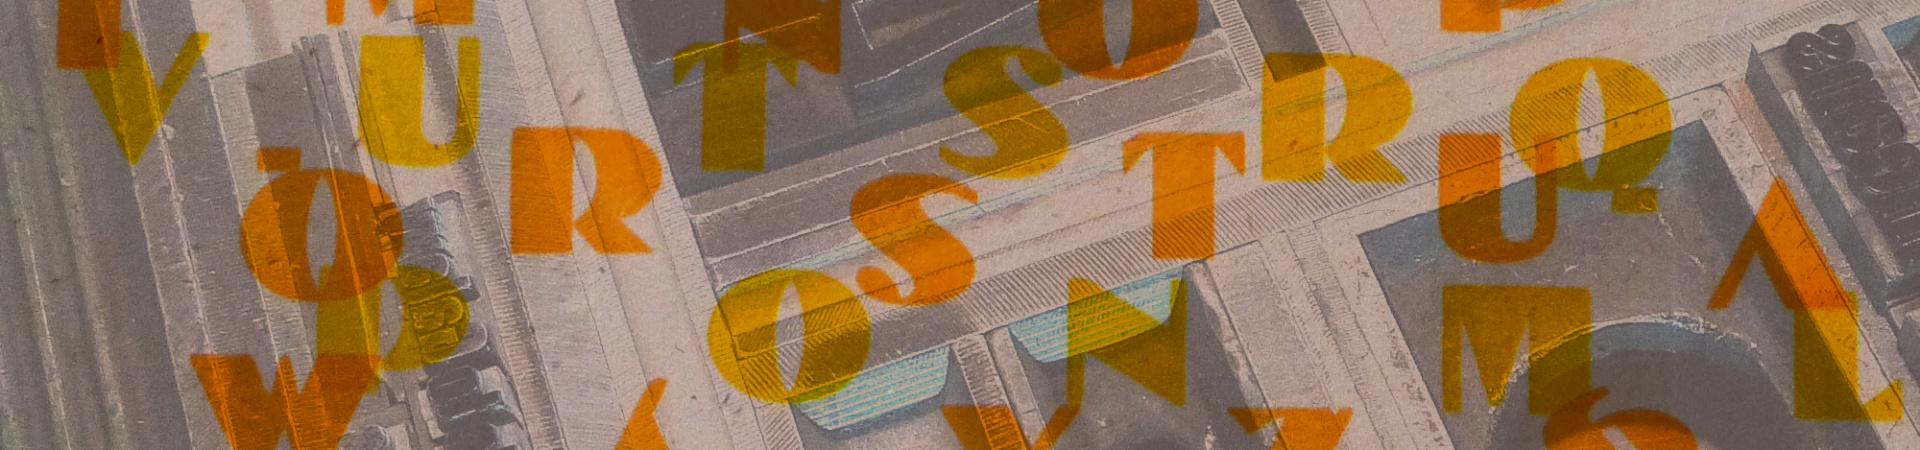 Post Digital Letterpress